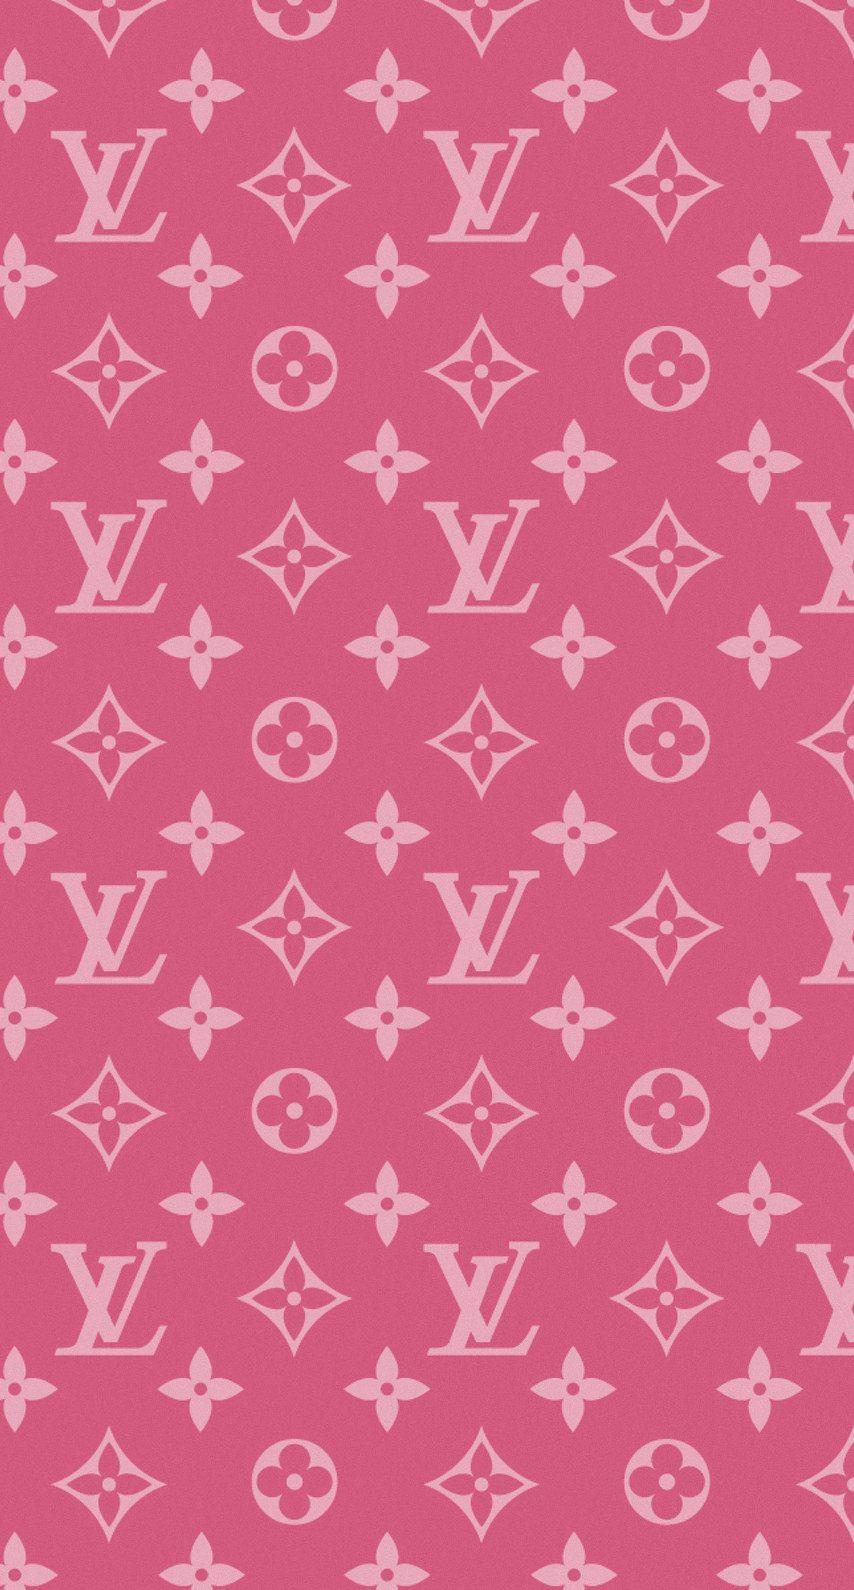 Louisvuittonpink2 Pink Wallpaper Iphone Louis Vuitton Iphone Wallpaper Iphone Wallpaper Vsco